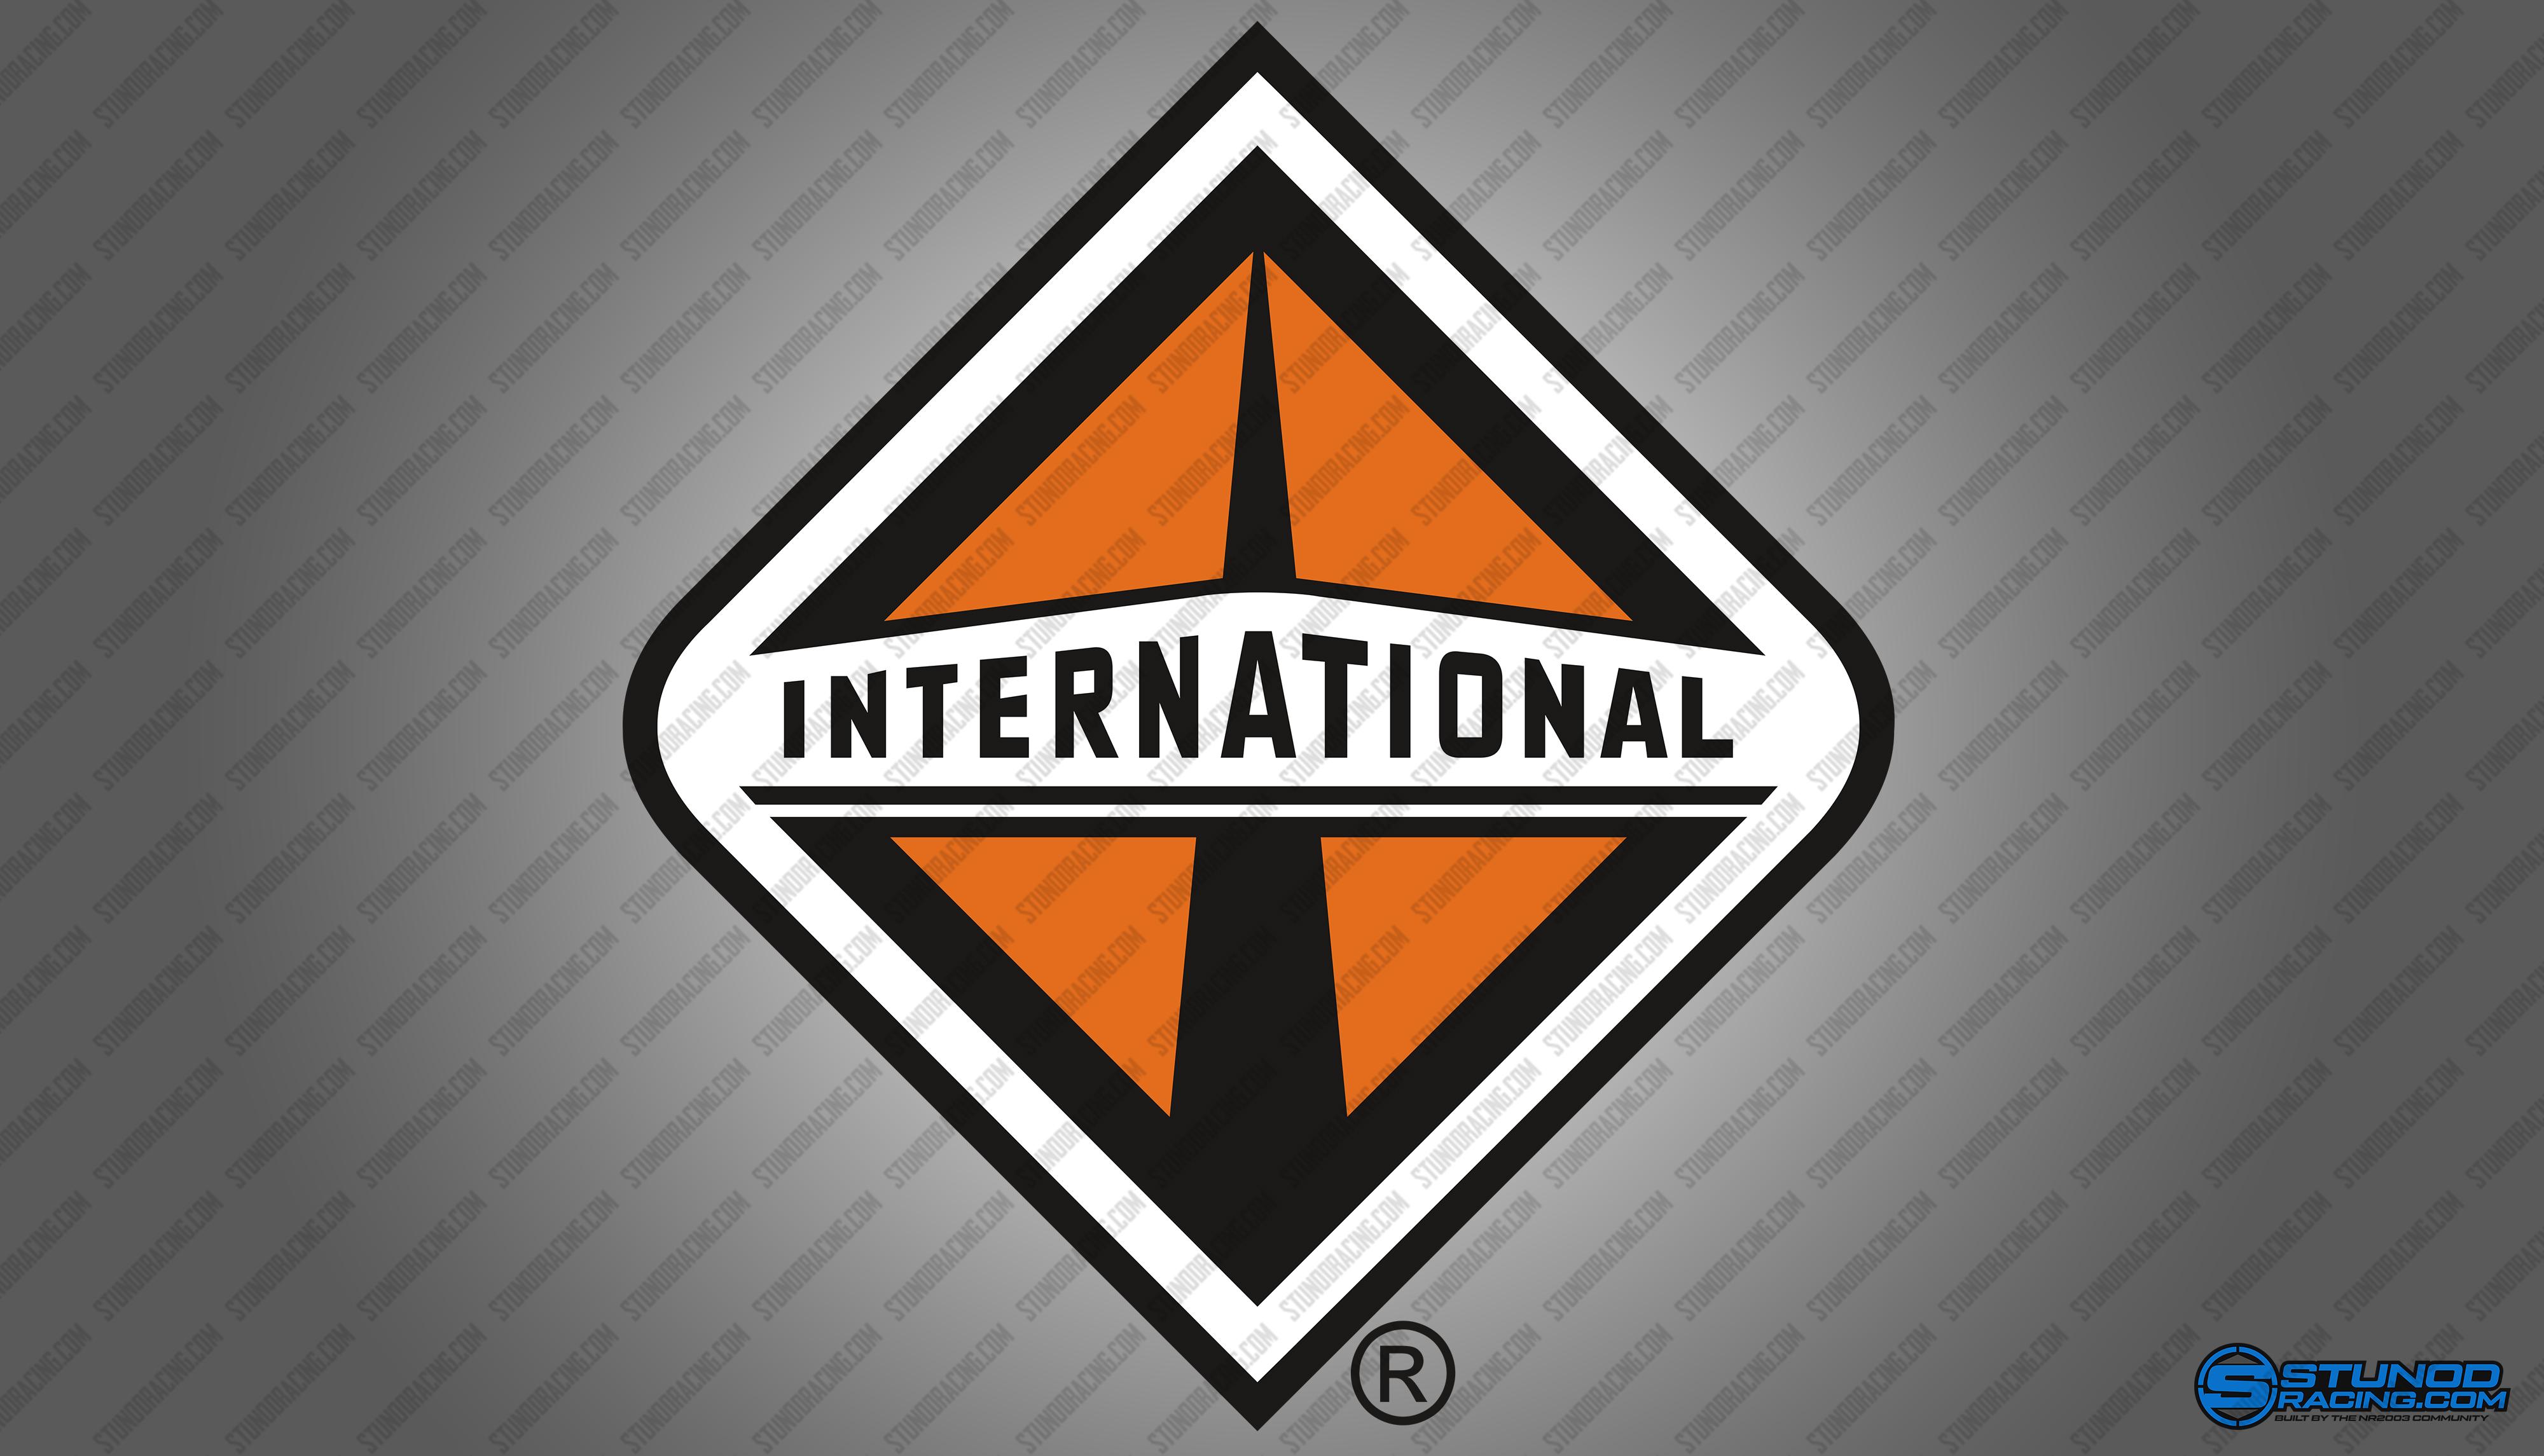 StunodRacing_Navistar_International_Logo.jpg